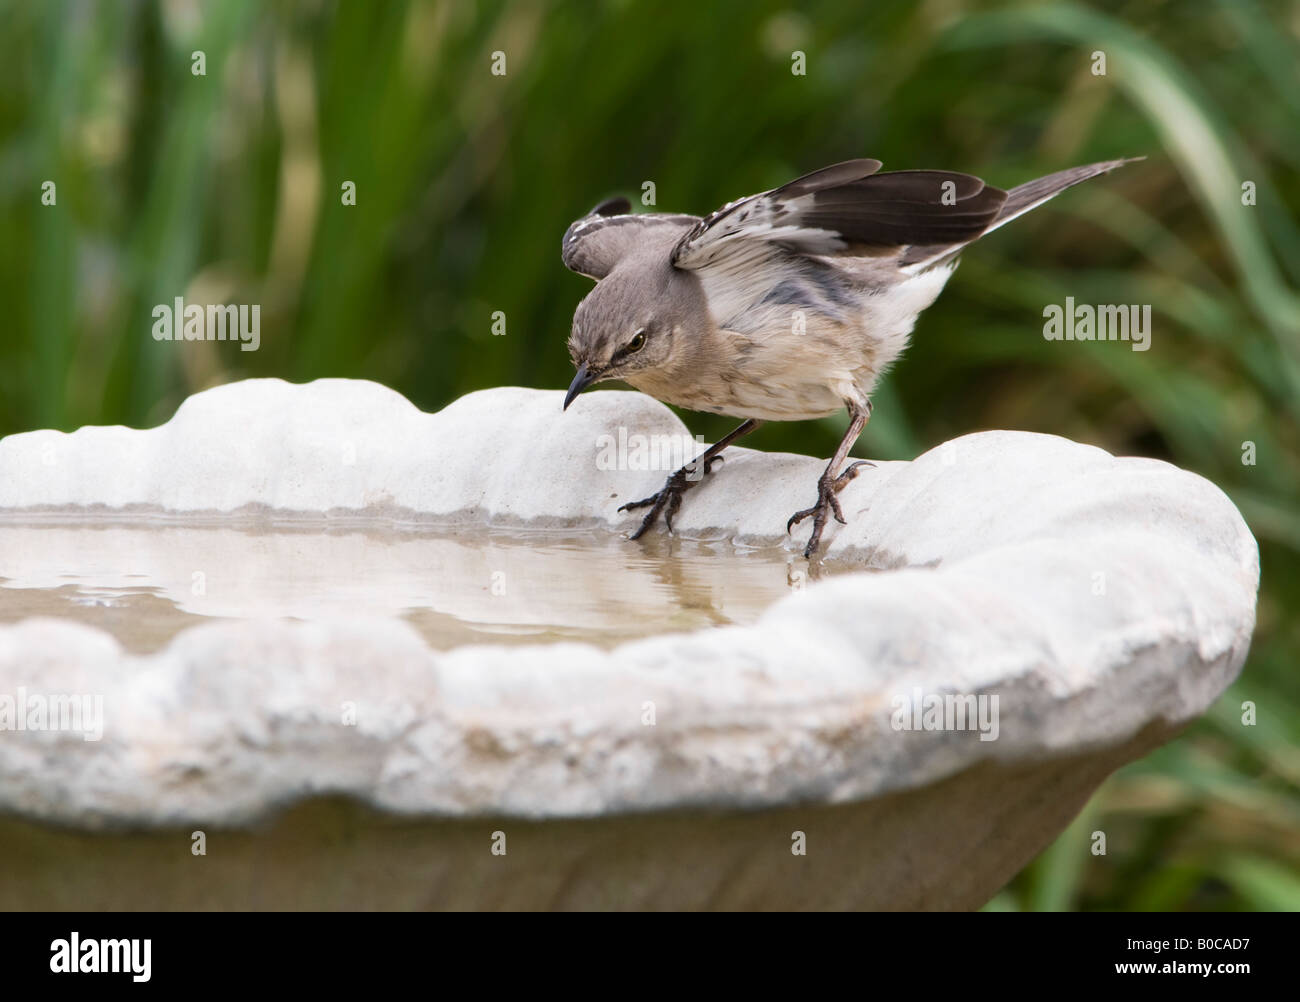 A Northern Mockingbird, Minus polyglollos, is poised to jump in a bird bath and bathe. Stock Photo